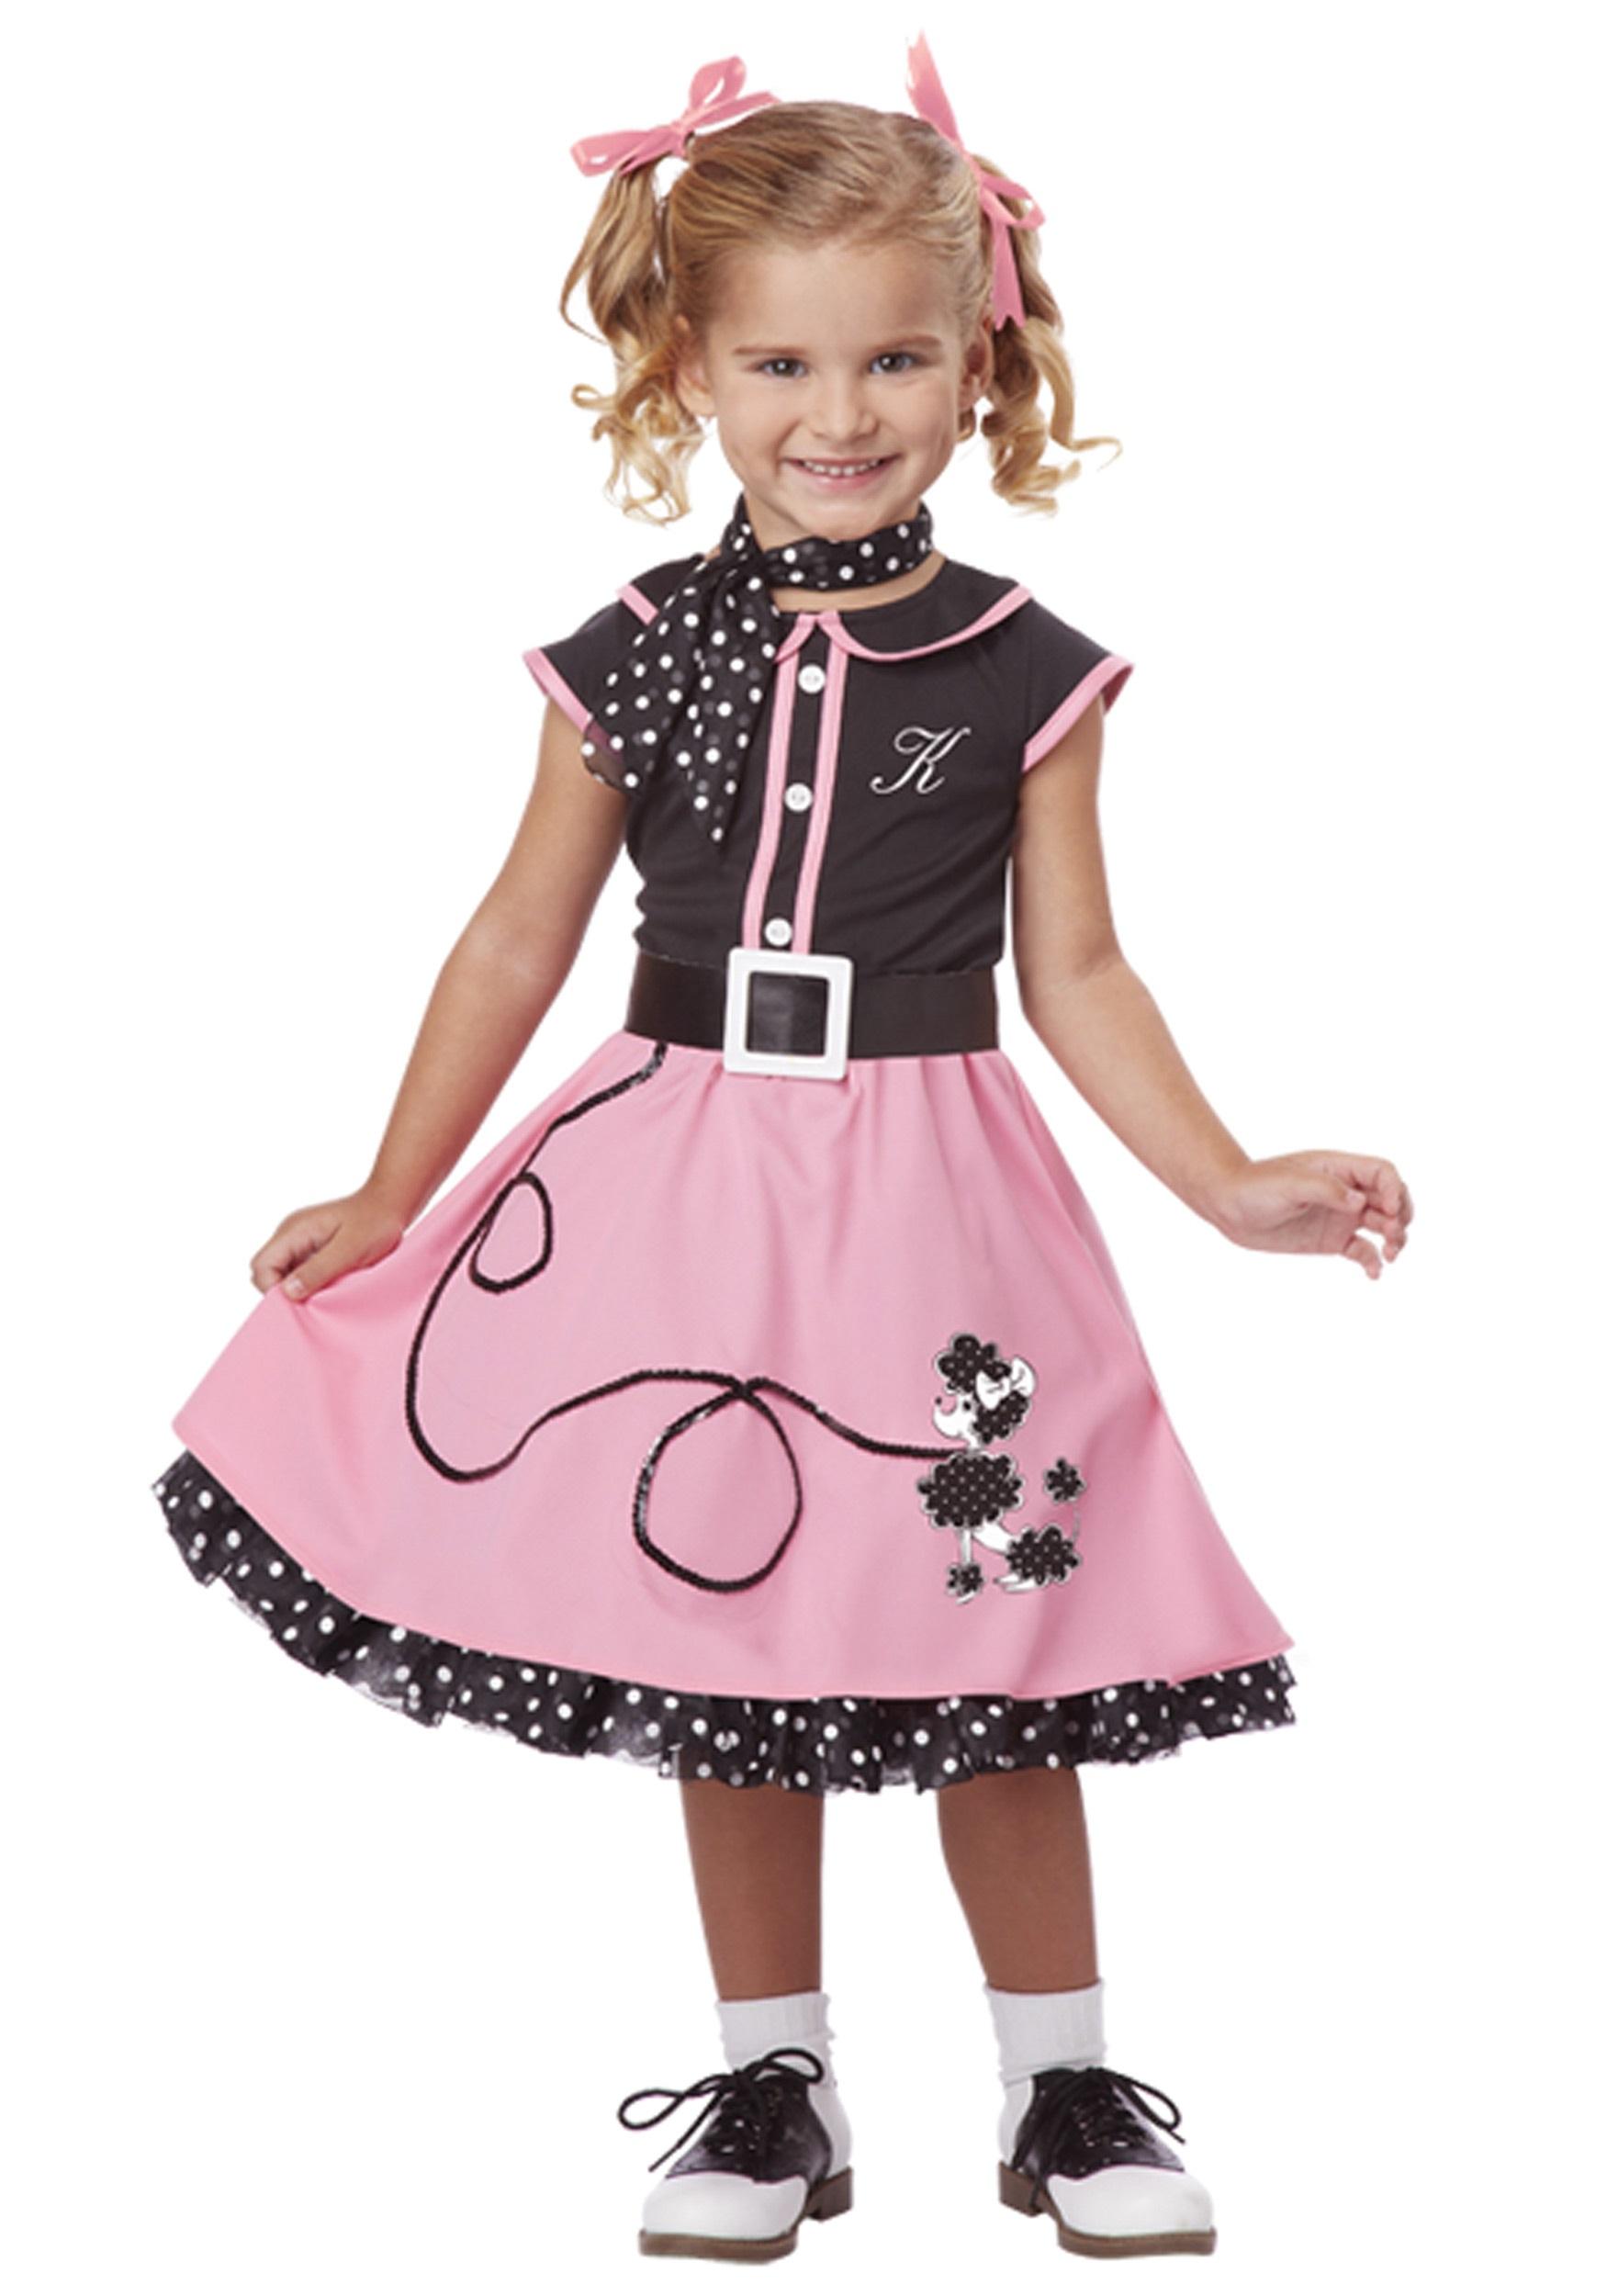 790c6de09cd4 50s Poodle Cutie Costume for Toddlers